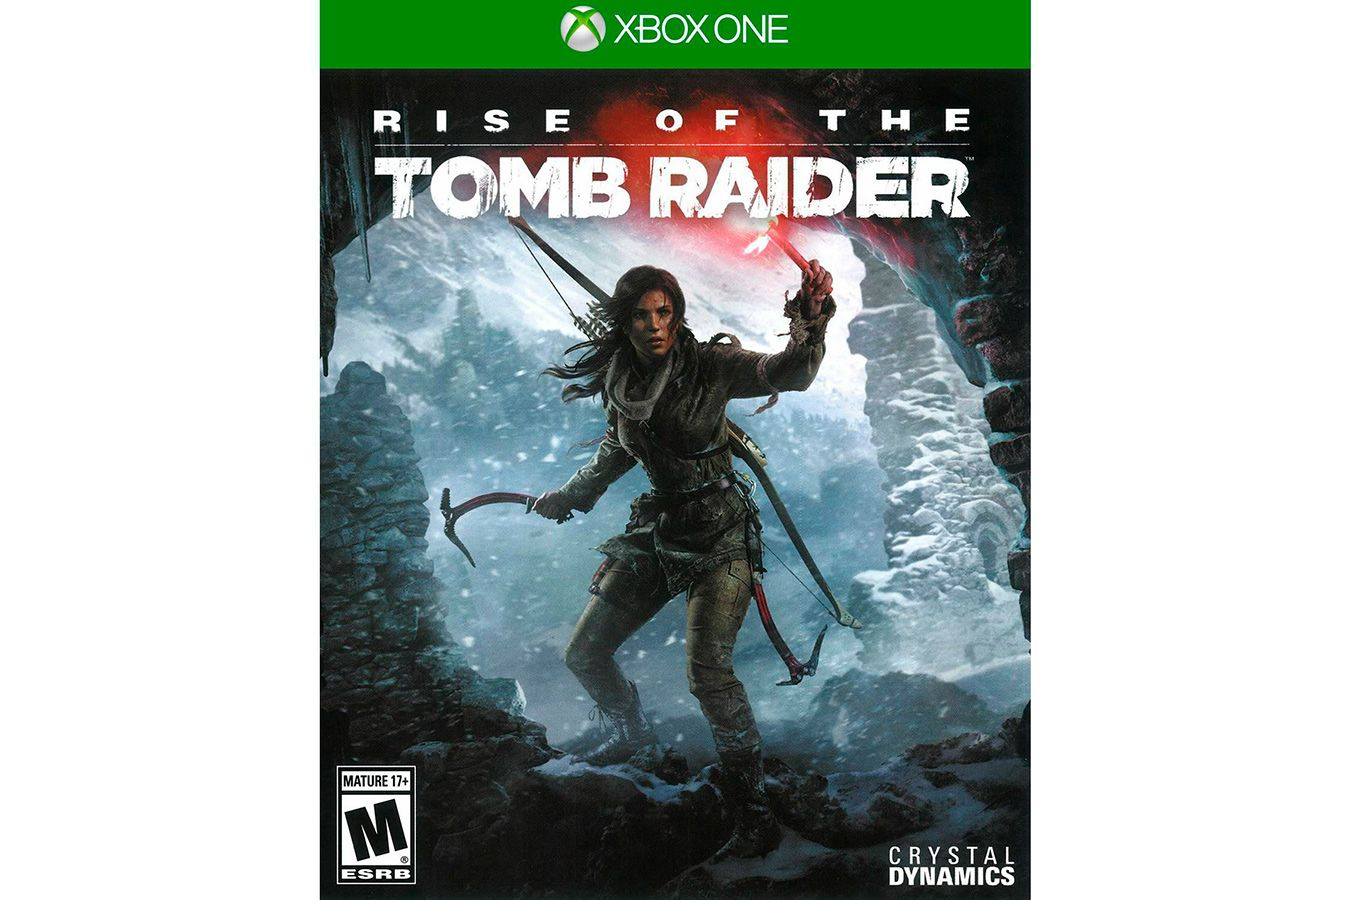 Xbox One Tomb Raider подарочная версия  изображение 1